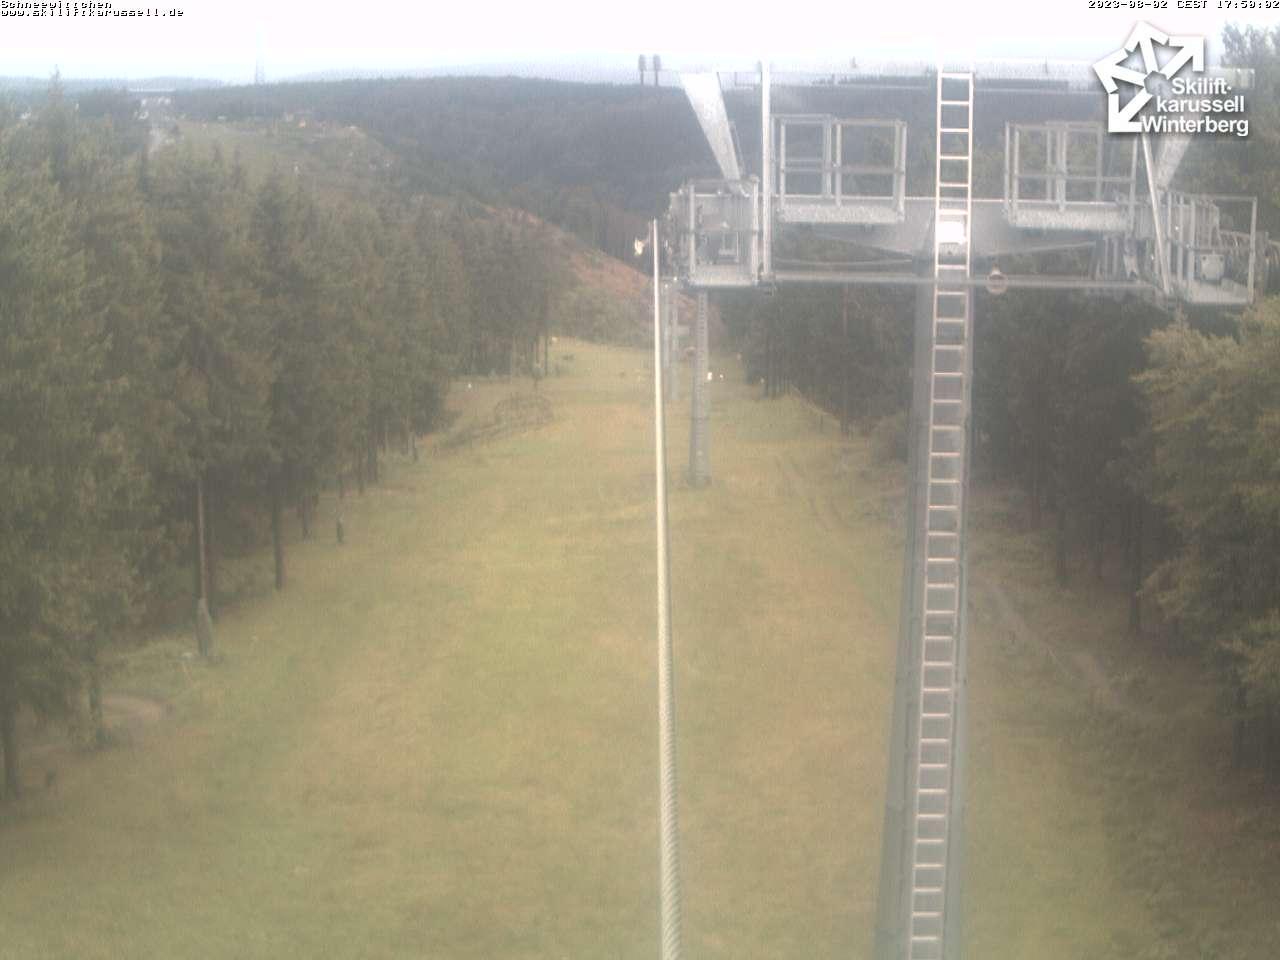 Webcam Winterberg - Schneewittchenhang